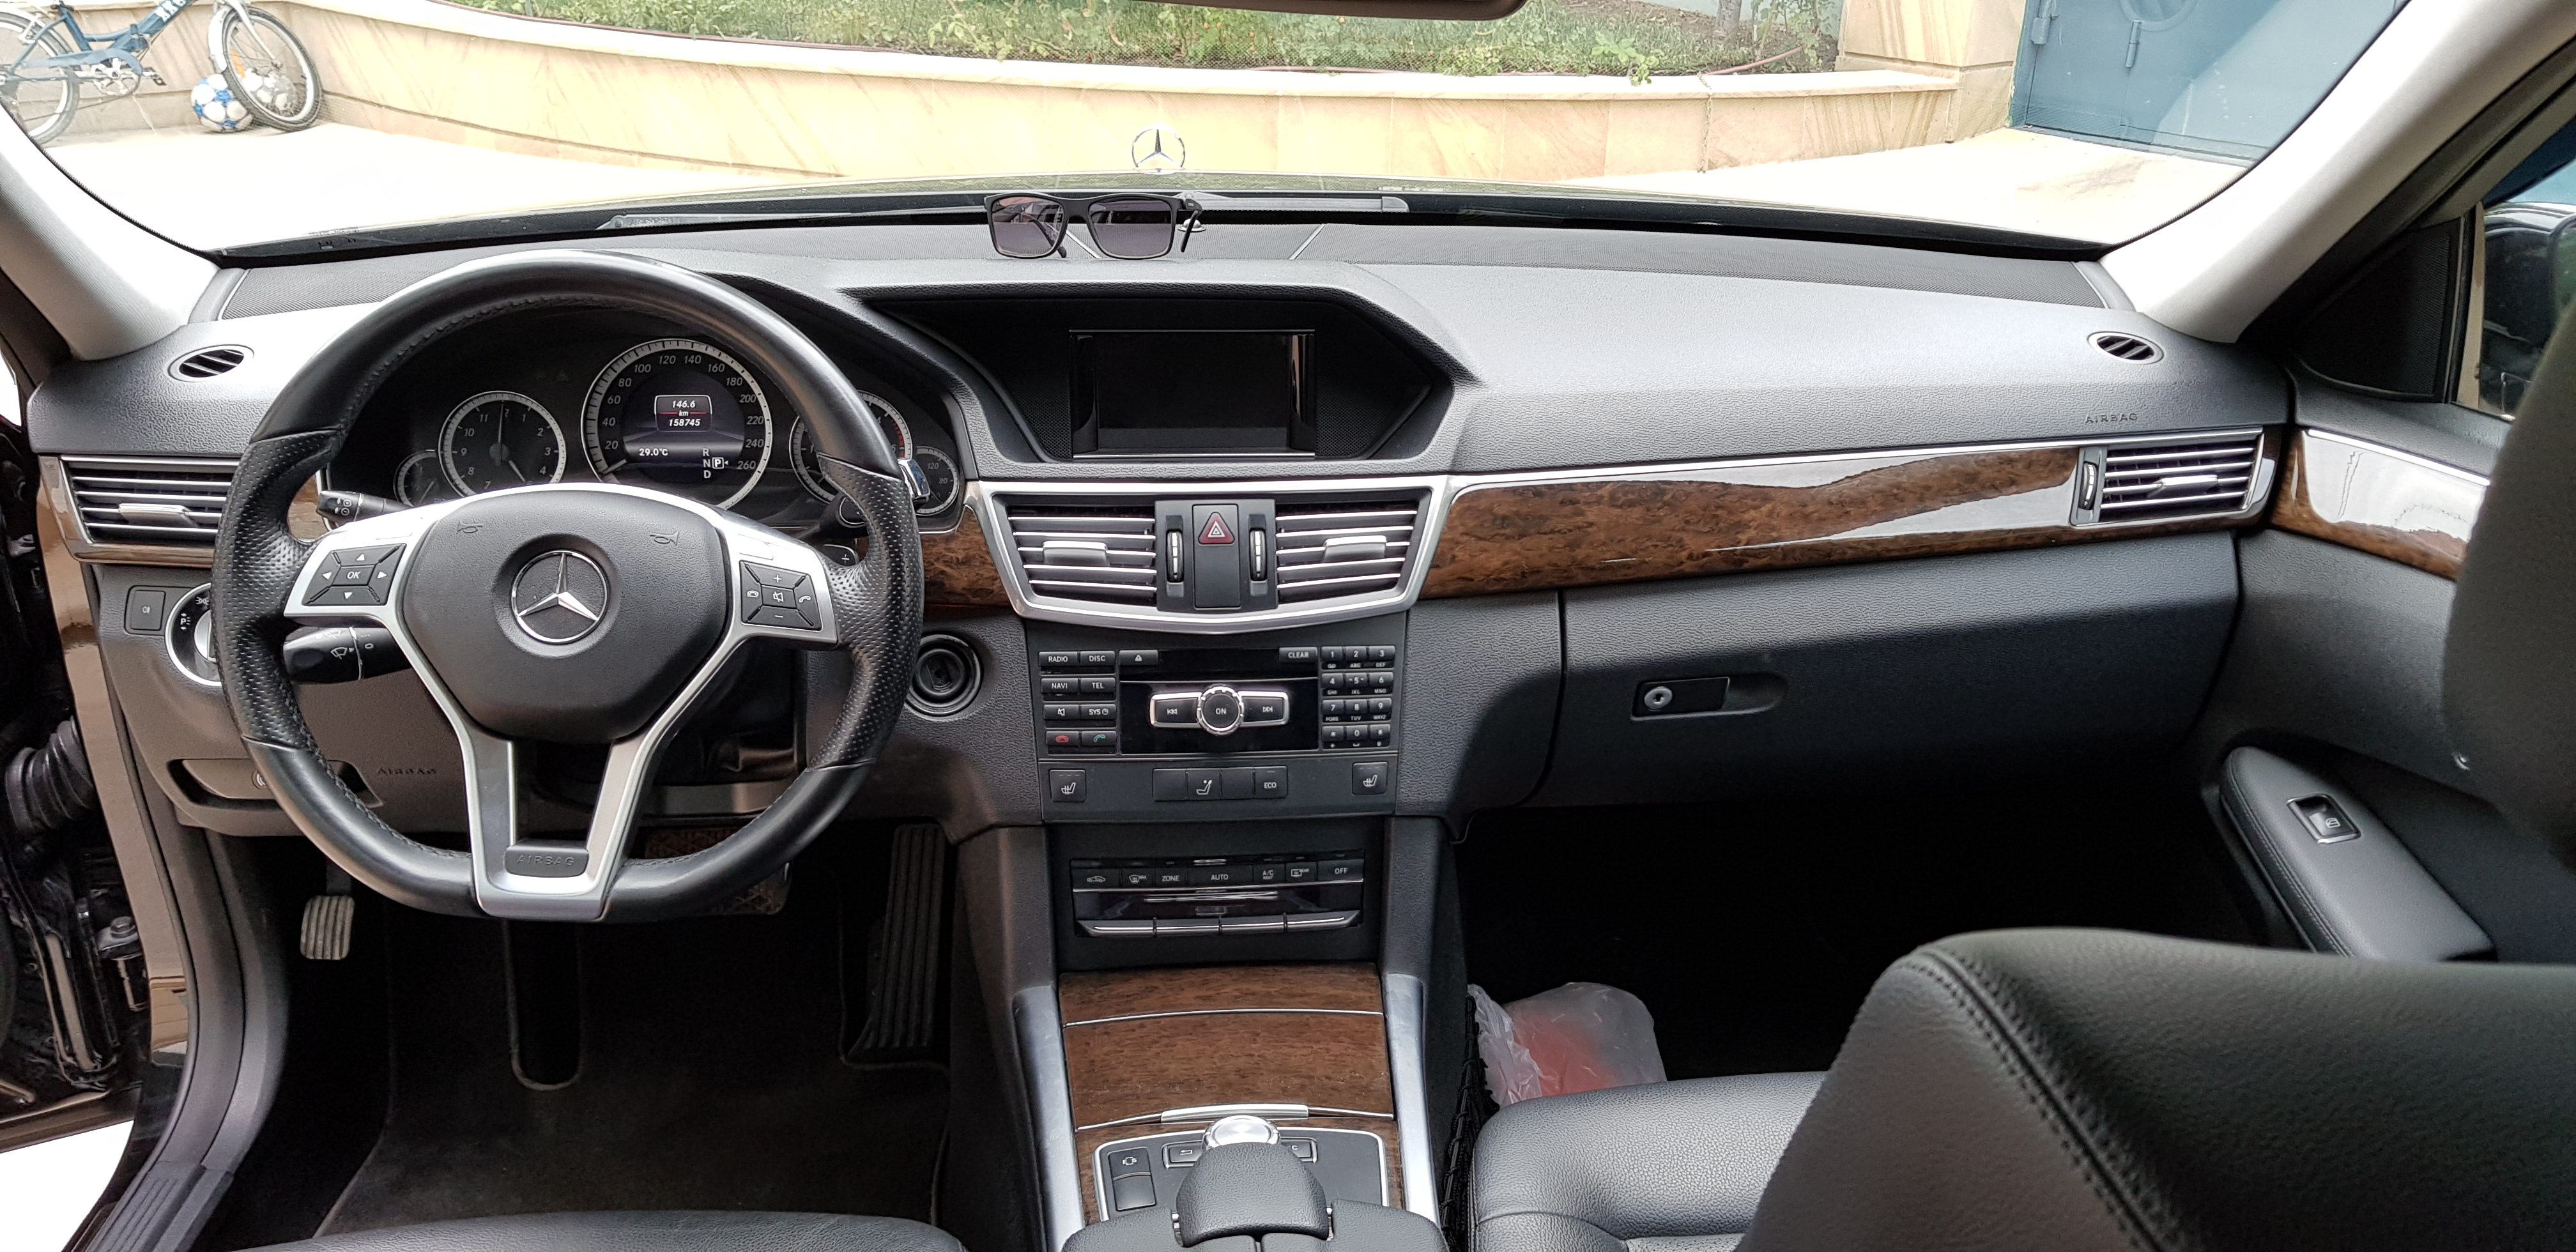 Mercedes-Benz E 220 2.2(lt) 2012 İkinci əl  $21900